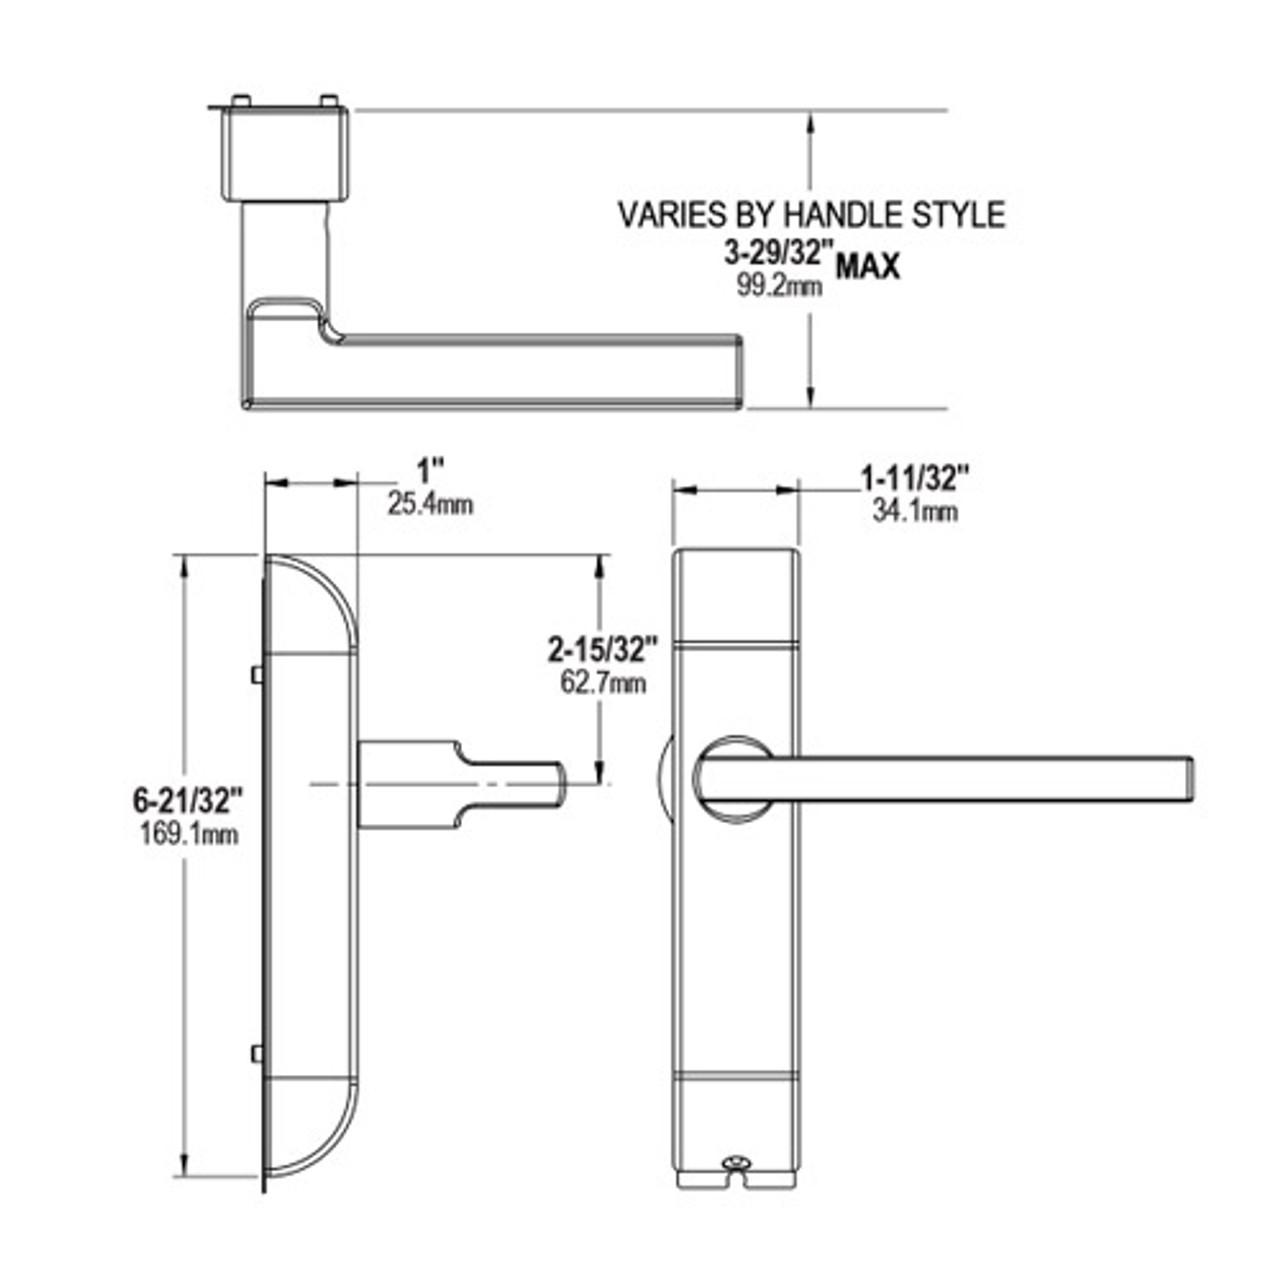 4600M-MW-611-US3 Adams Rite MW Designer handle Dimensional View